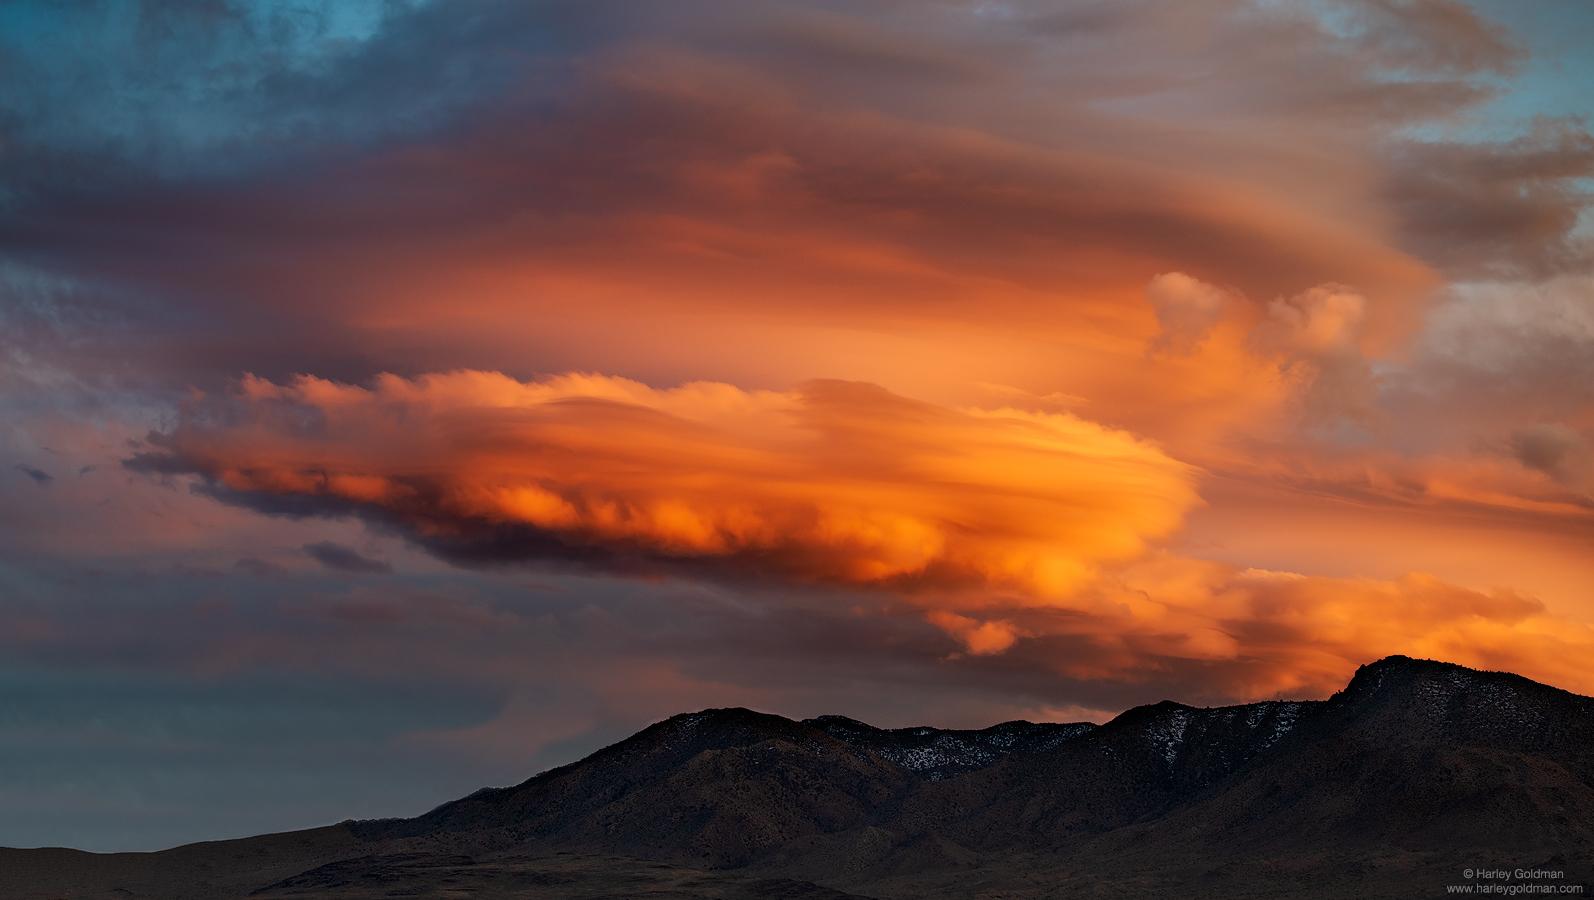 death valley, billowing, orange, cloud, sunset, desert, evening, lenticular